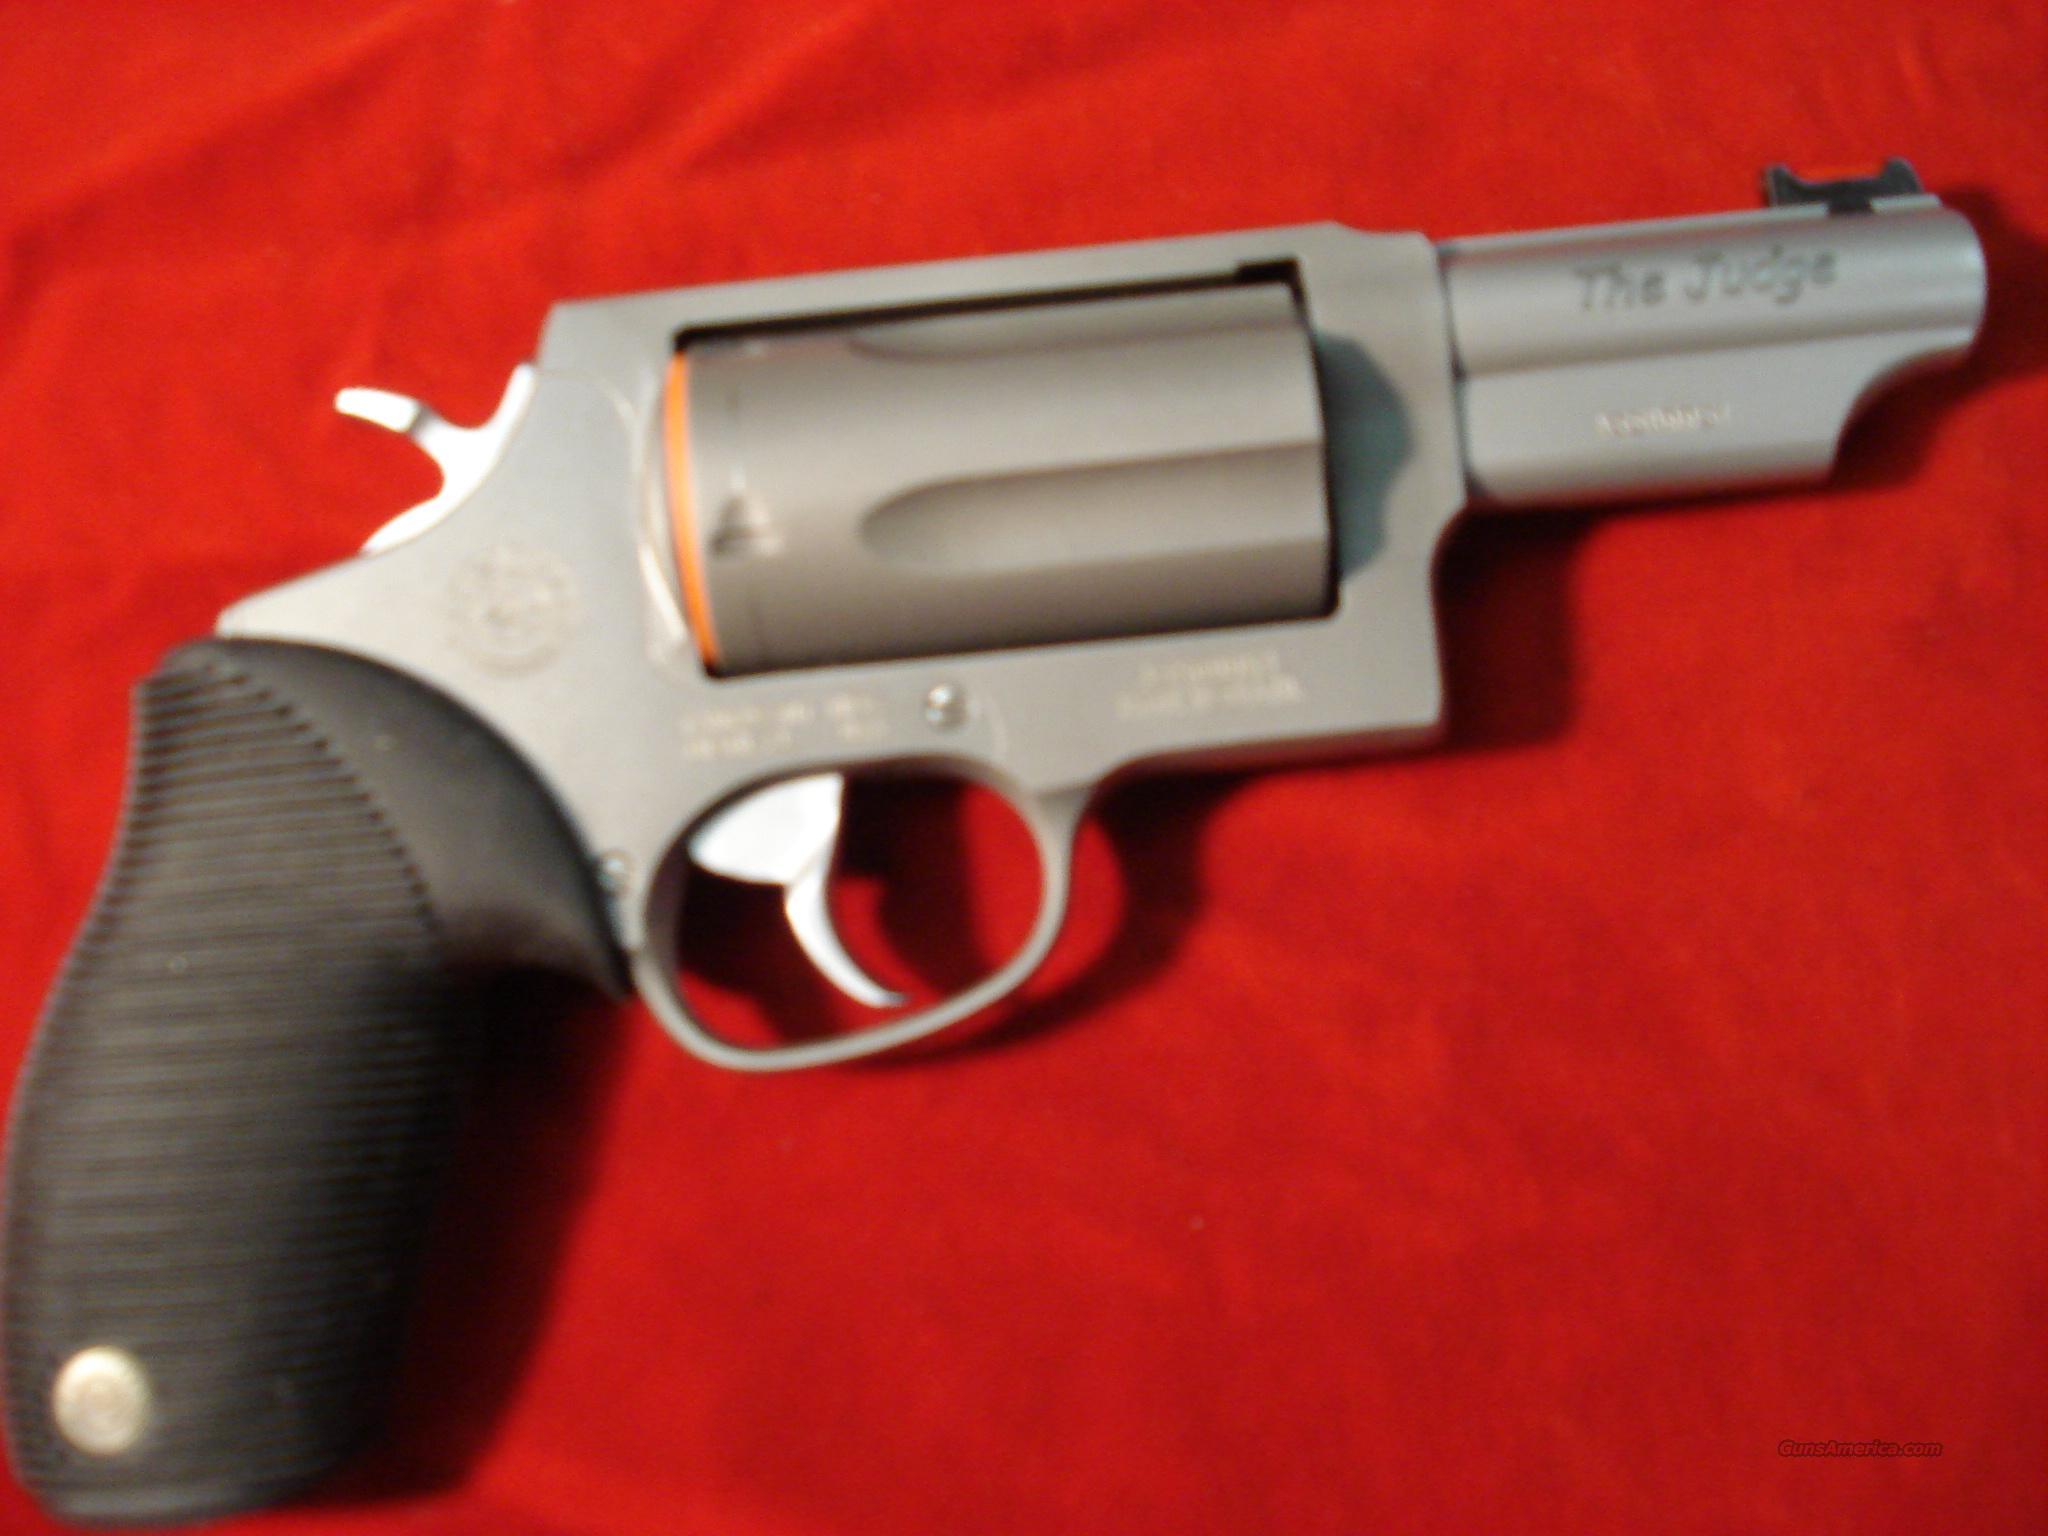 "TAURUS 4510 ULTRA-LITE TRACKER 410G REVOLVER ""THE JUDGE""  Guns > Pistols > Taurus Pistols/Revolvers > Revolvers"